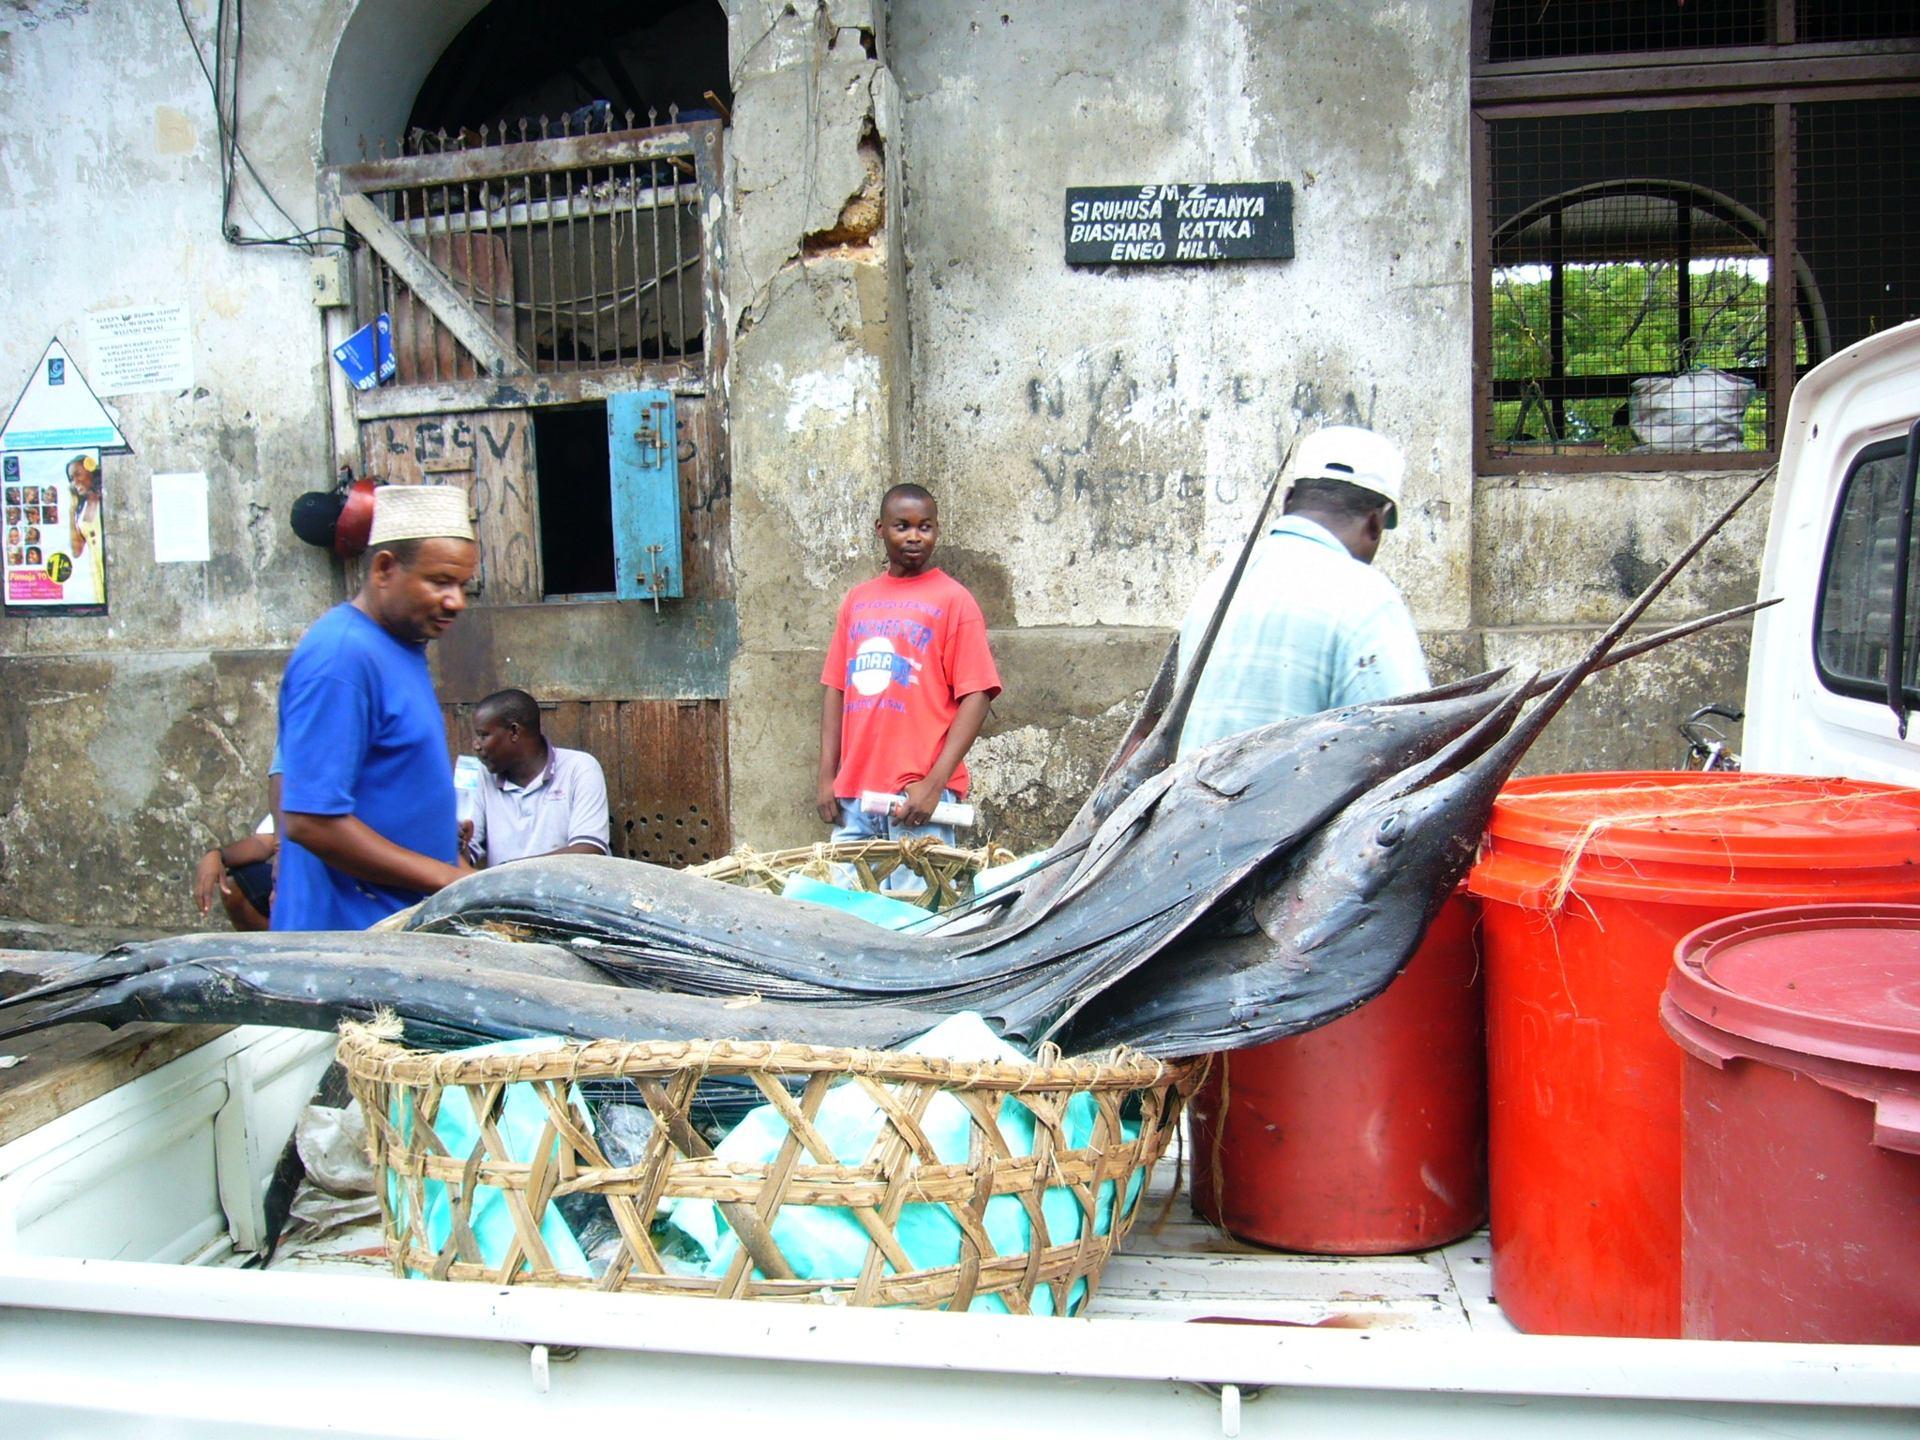 Livraison d'Espadons, marché de Zanzibar (Tanzanie)